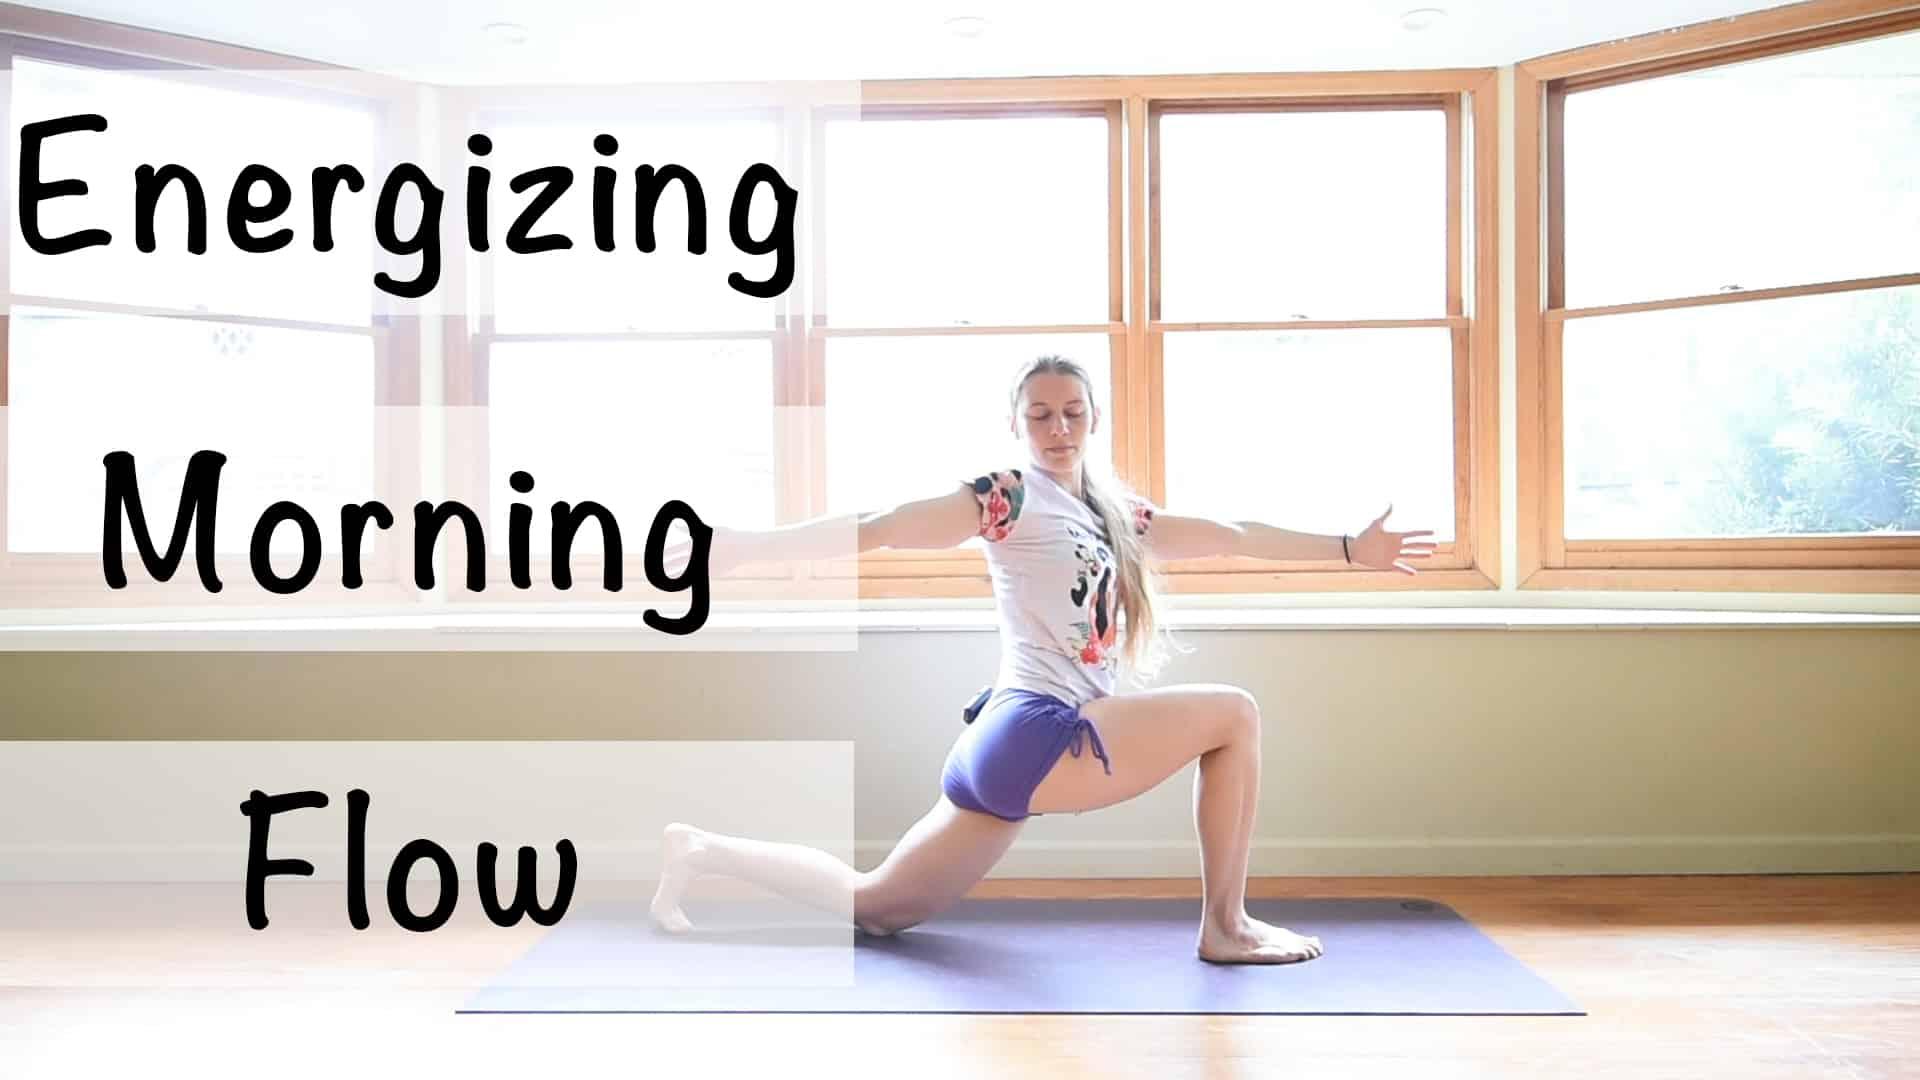 energizing morning flow yoga class